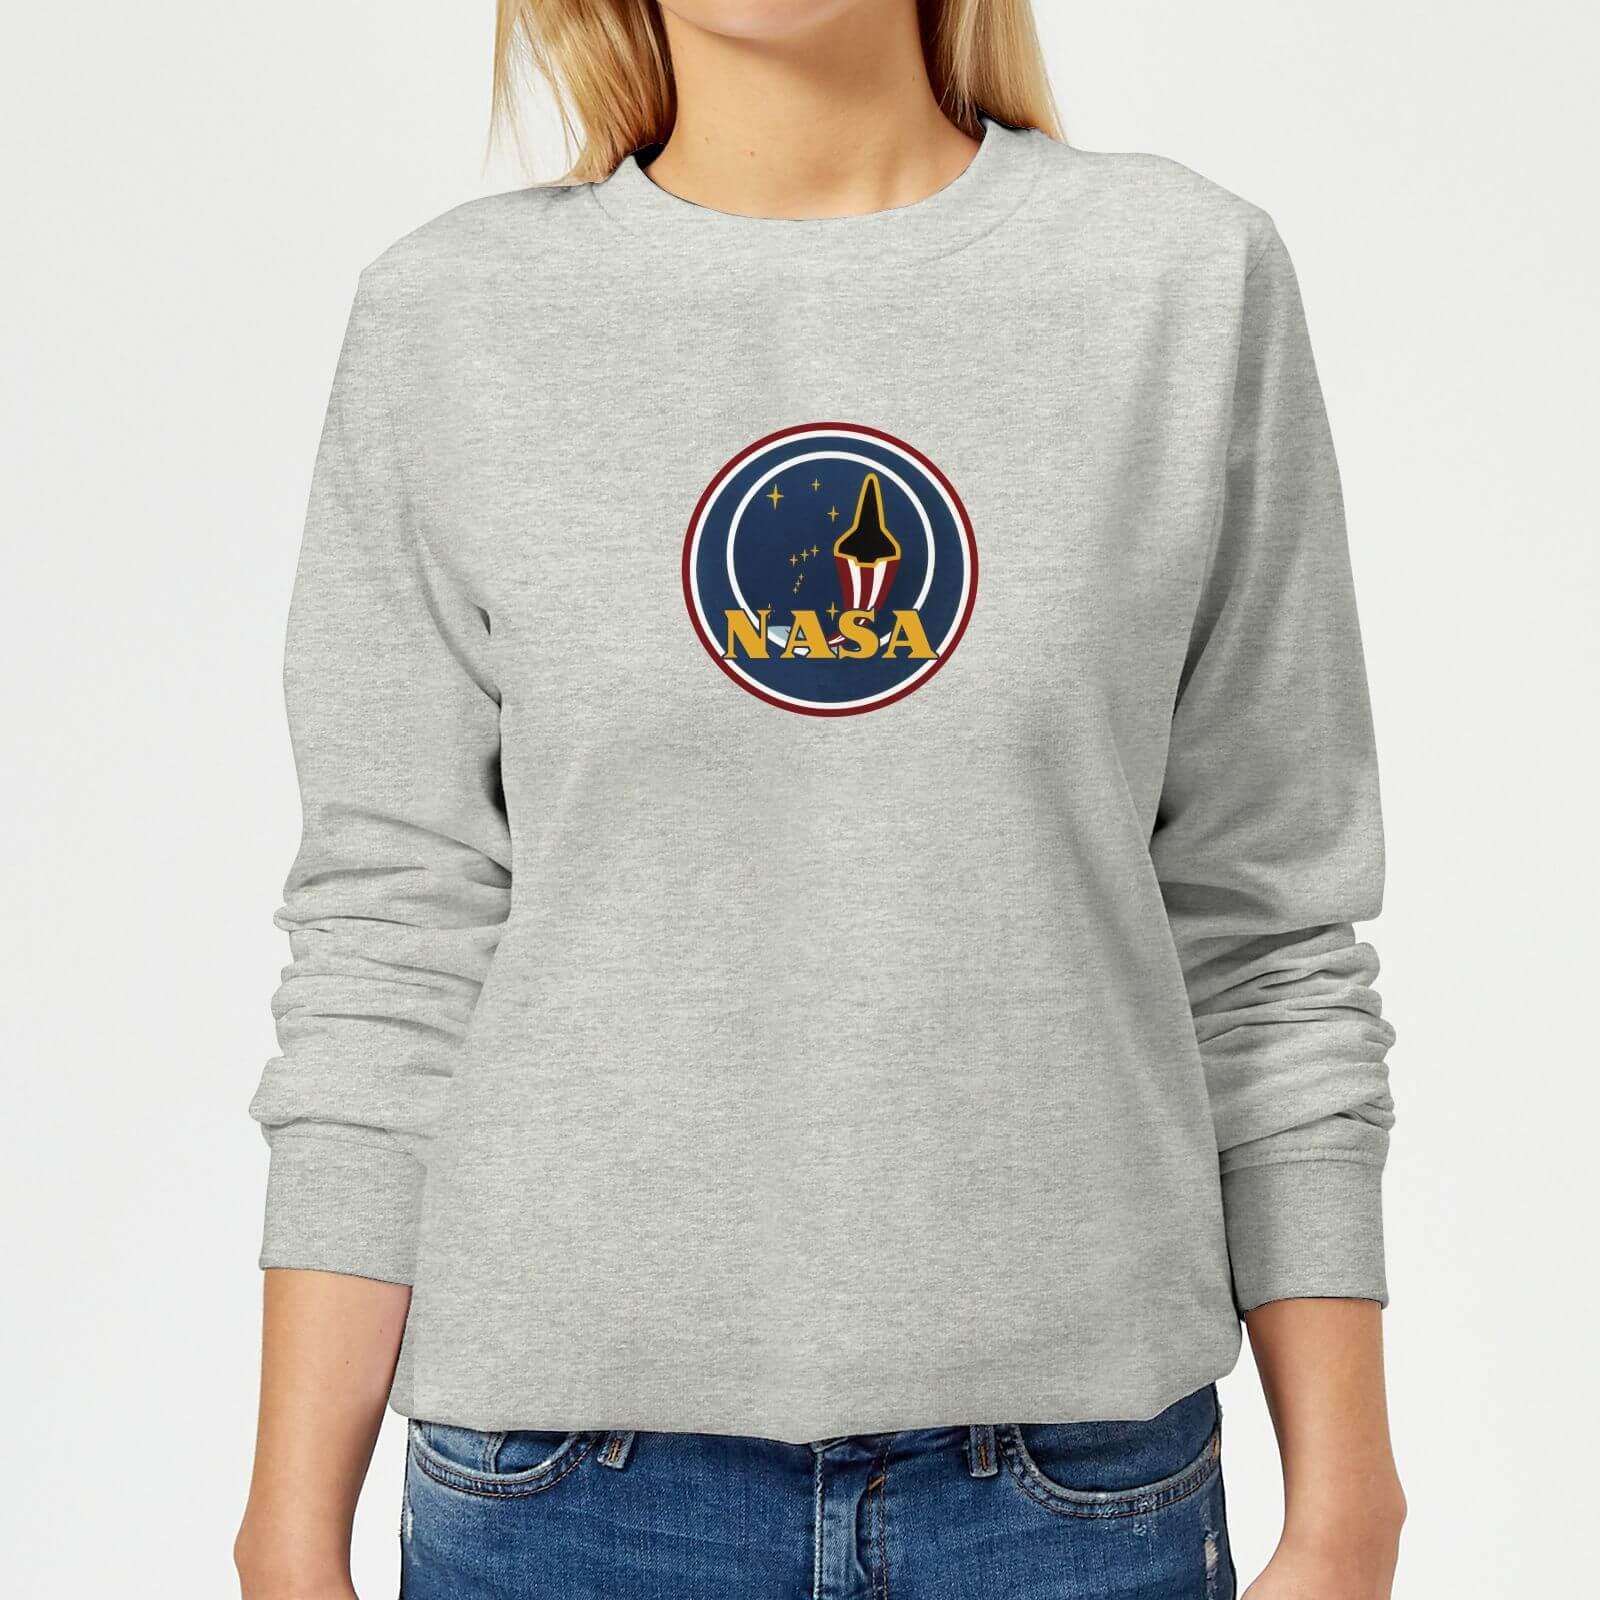 e6c8f670 NASA JM Patch Women's Sweatshirt - Grey Clothing | Zavvi